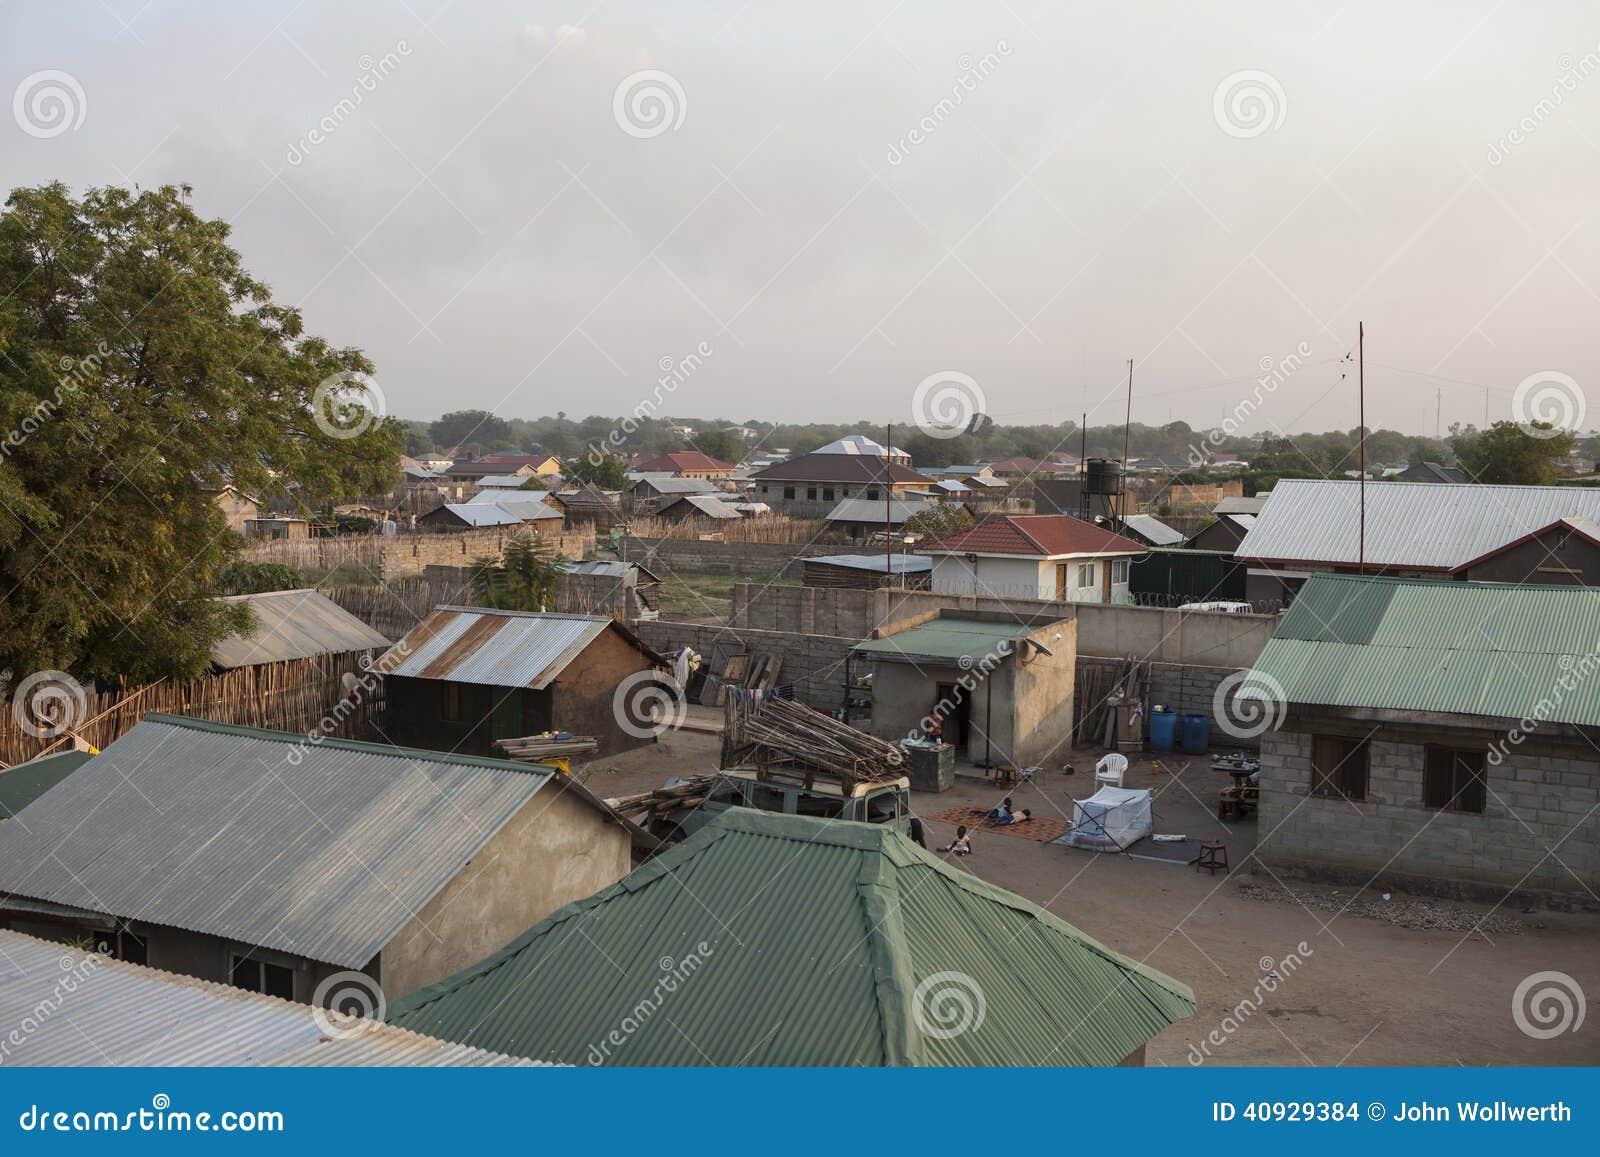 Juba, South Sudan stock photo  Image of sudan, slum, nobody - 40929384